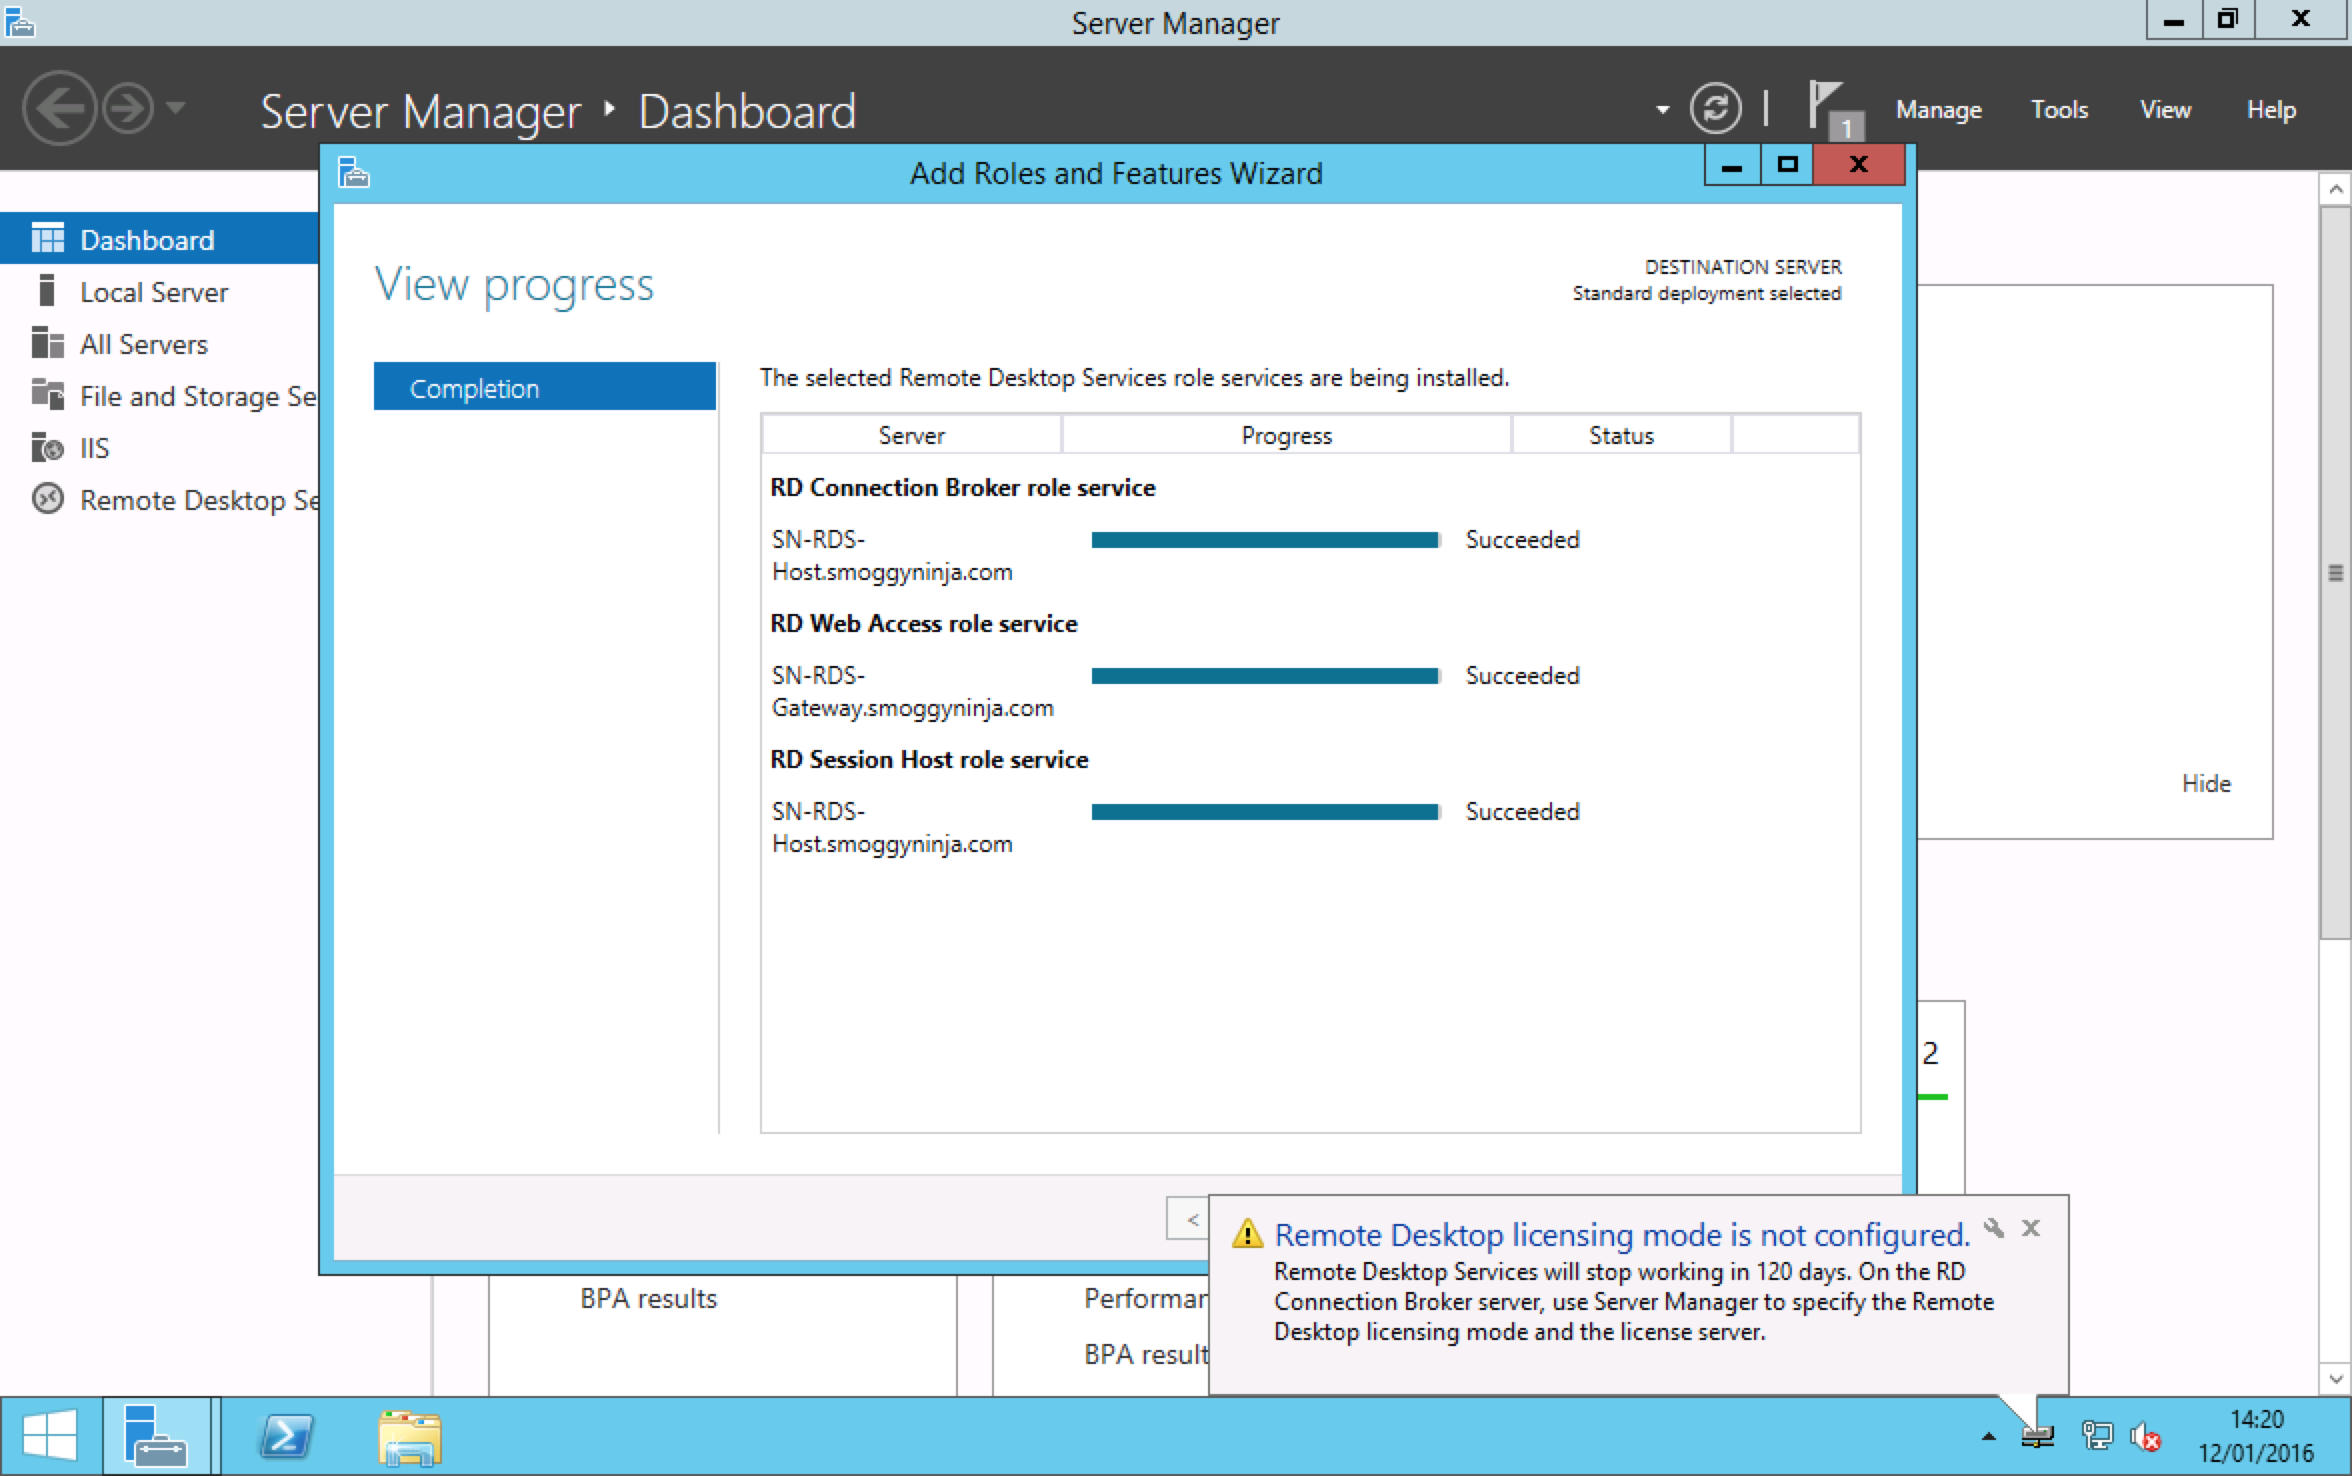 Windows Server 2012 R2 - Deploying Remote Desktop Services   PeteNetLive